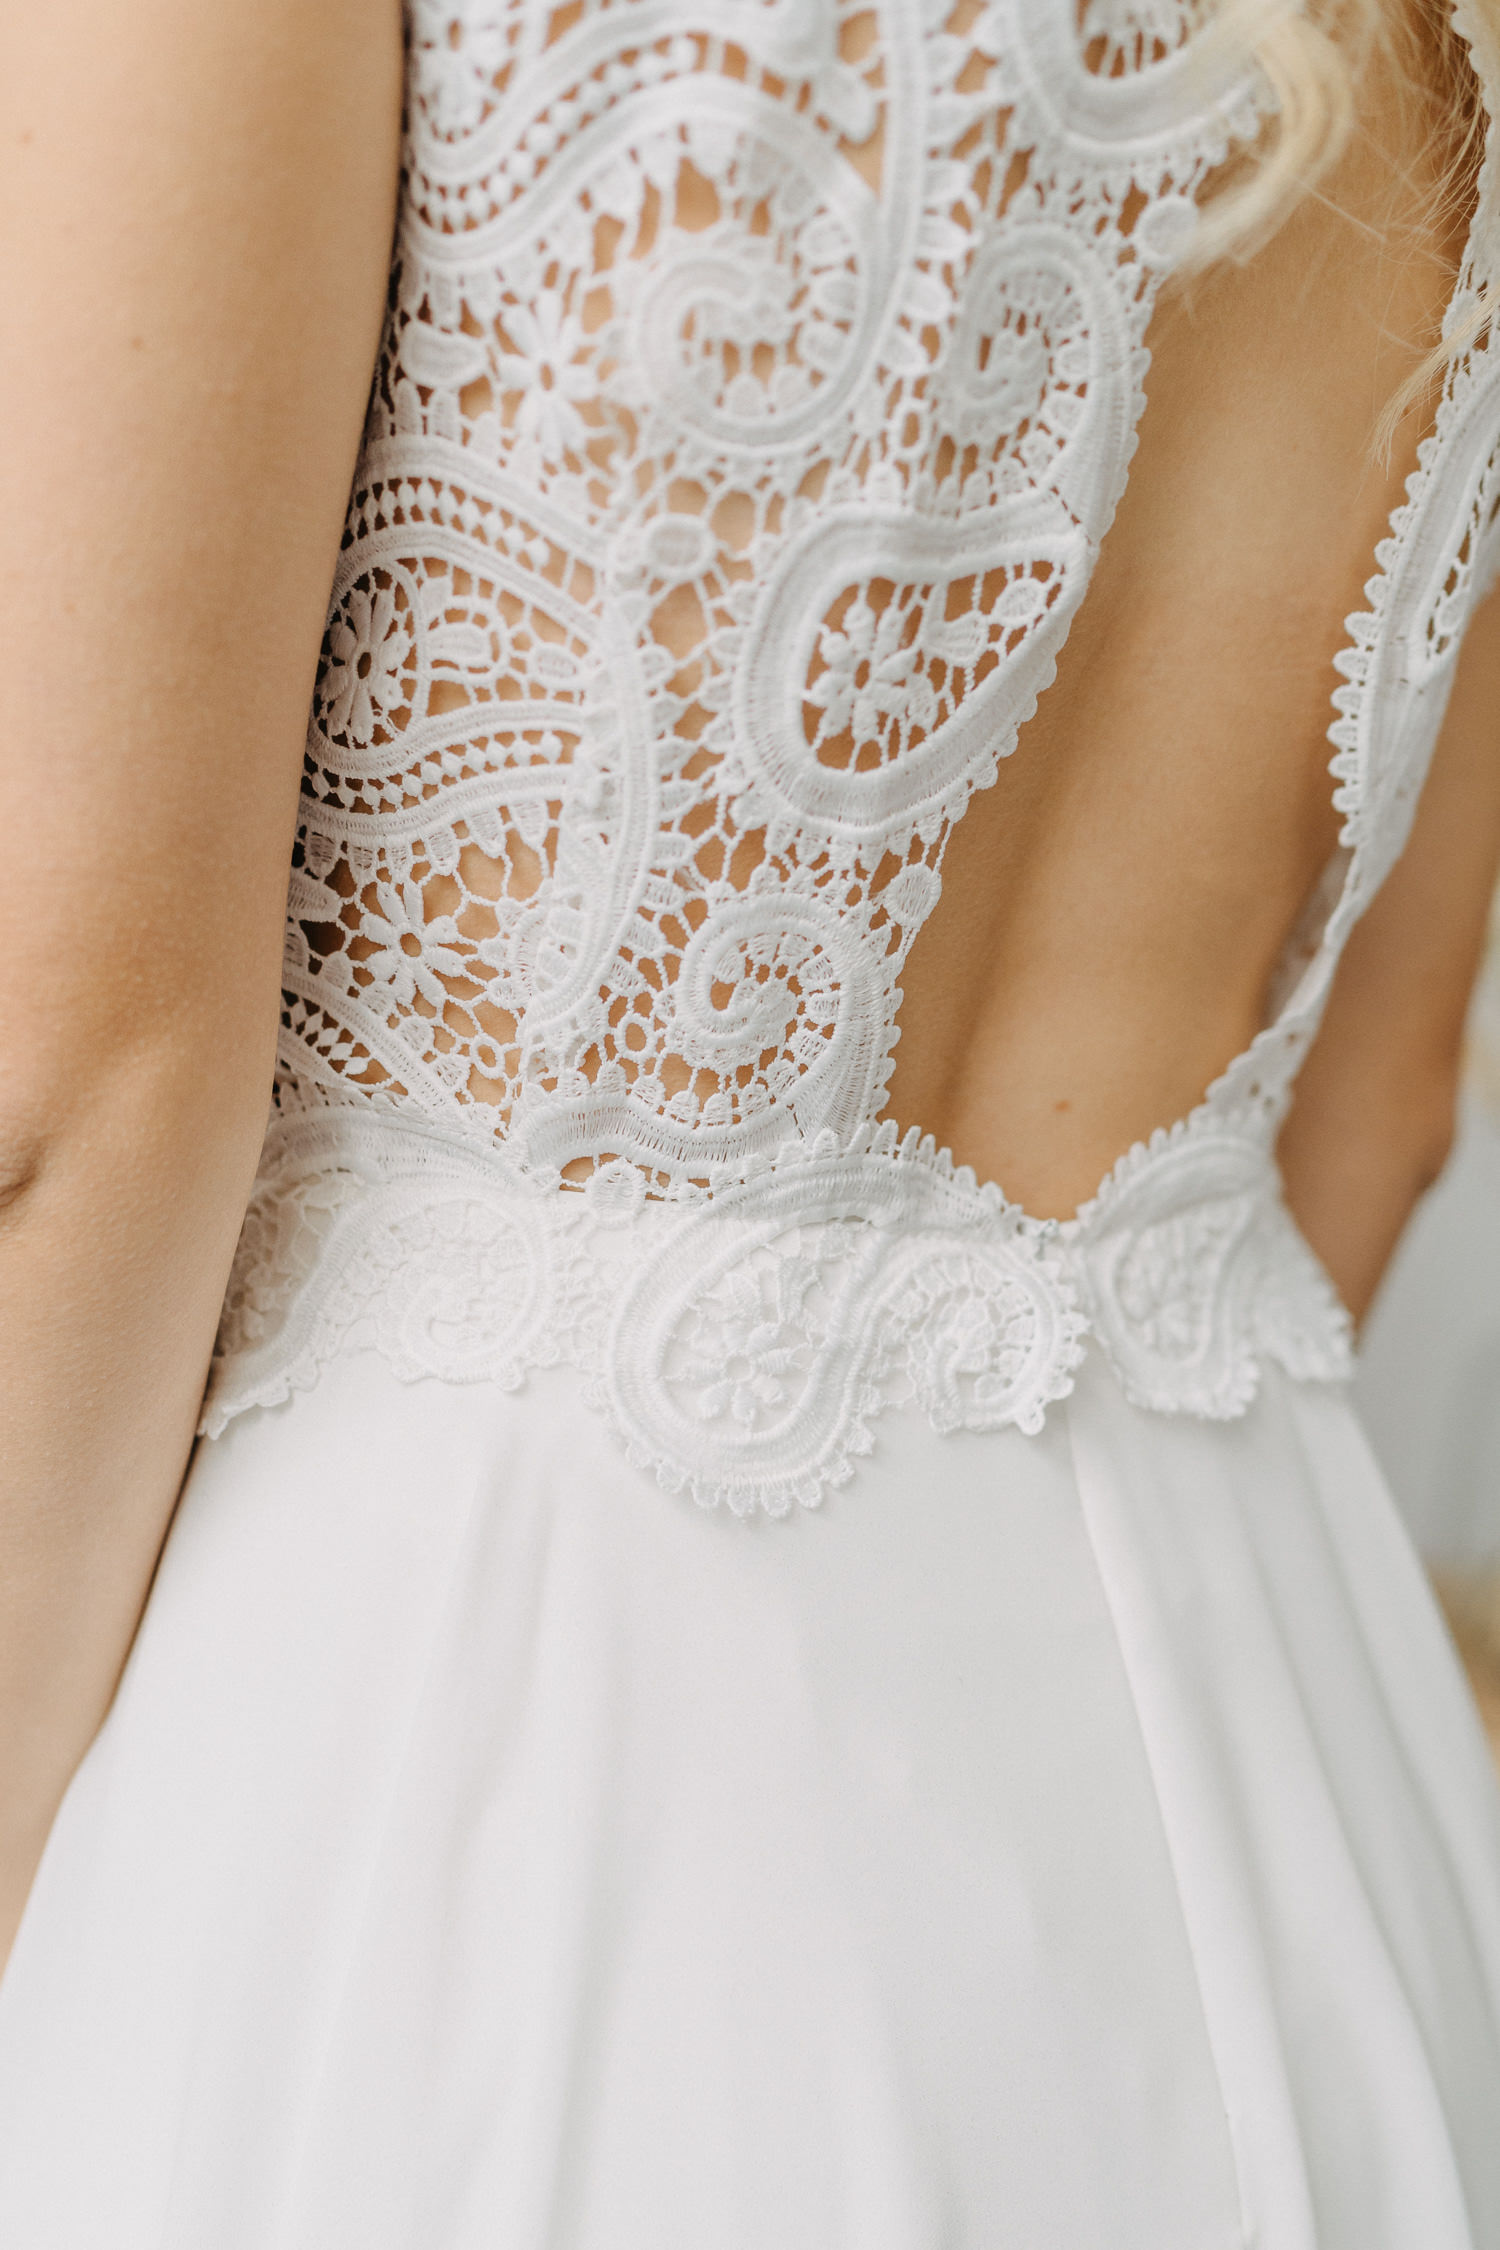 Brautkleid rückenausschnitt Bohospitze